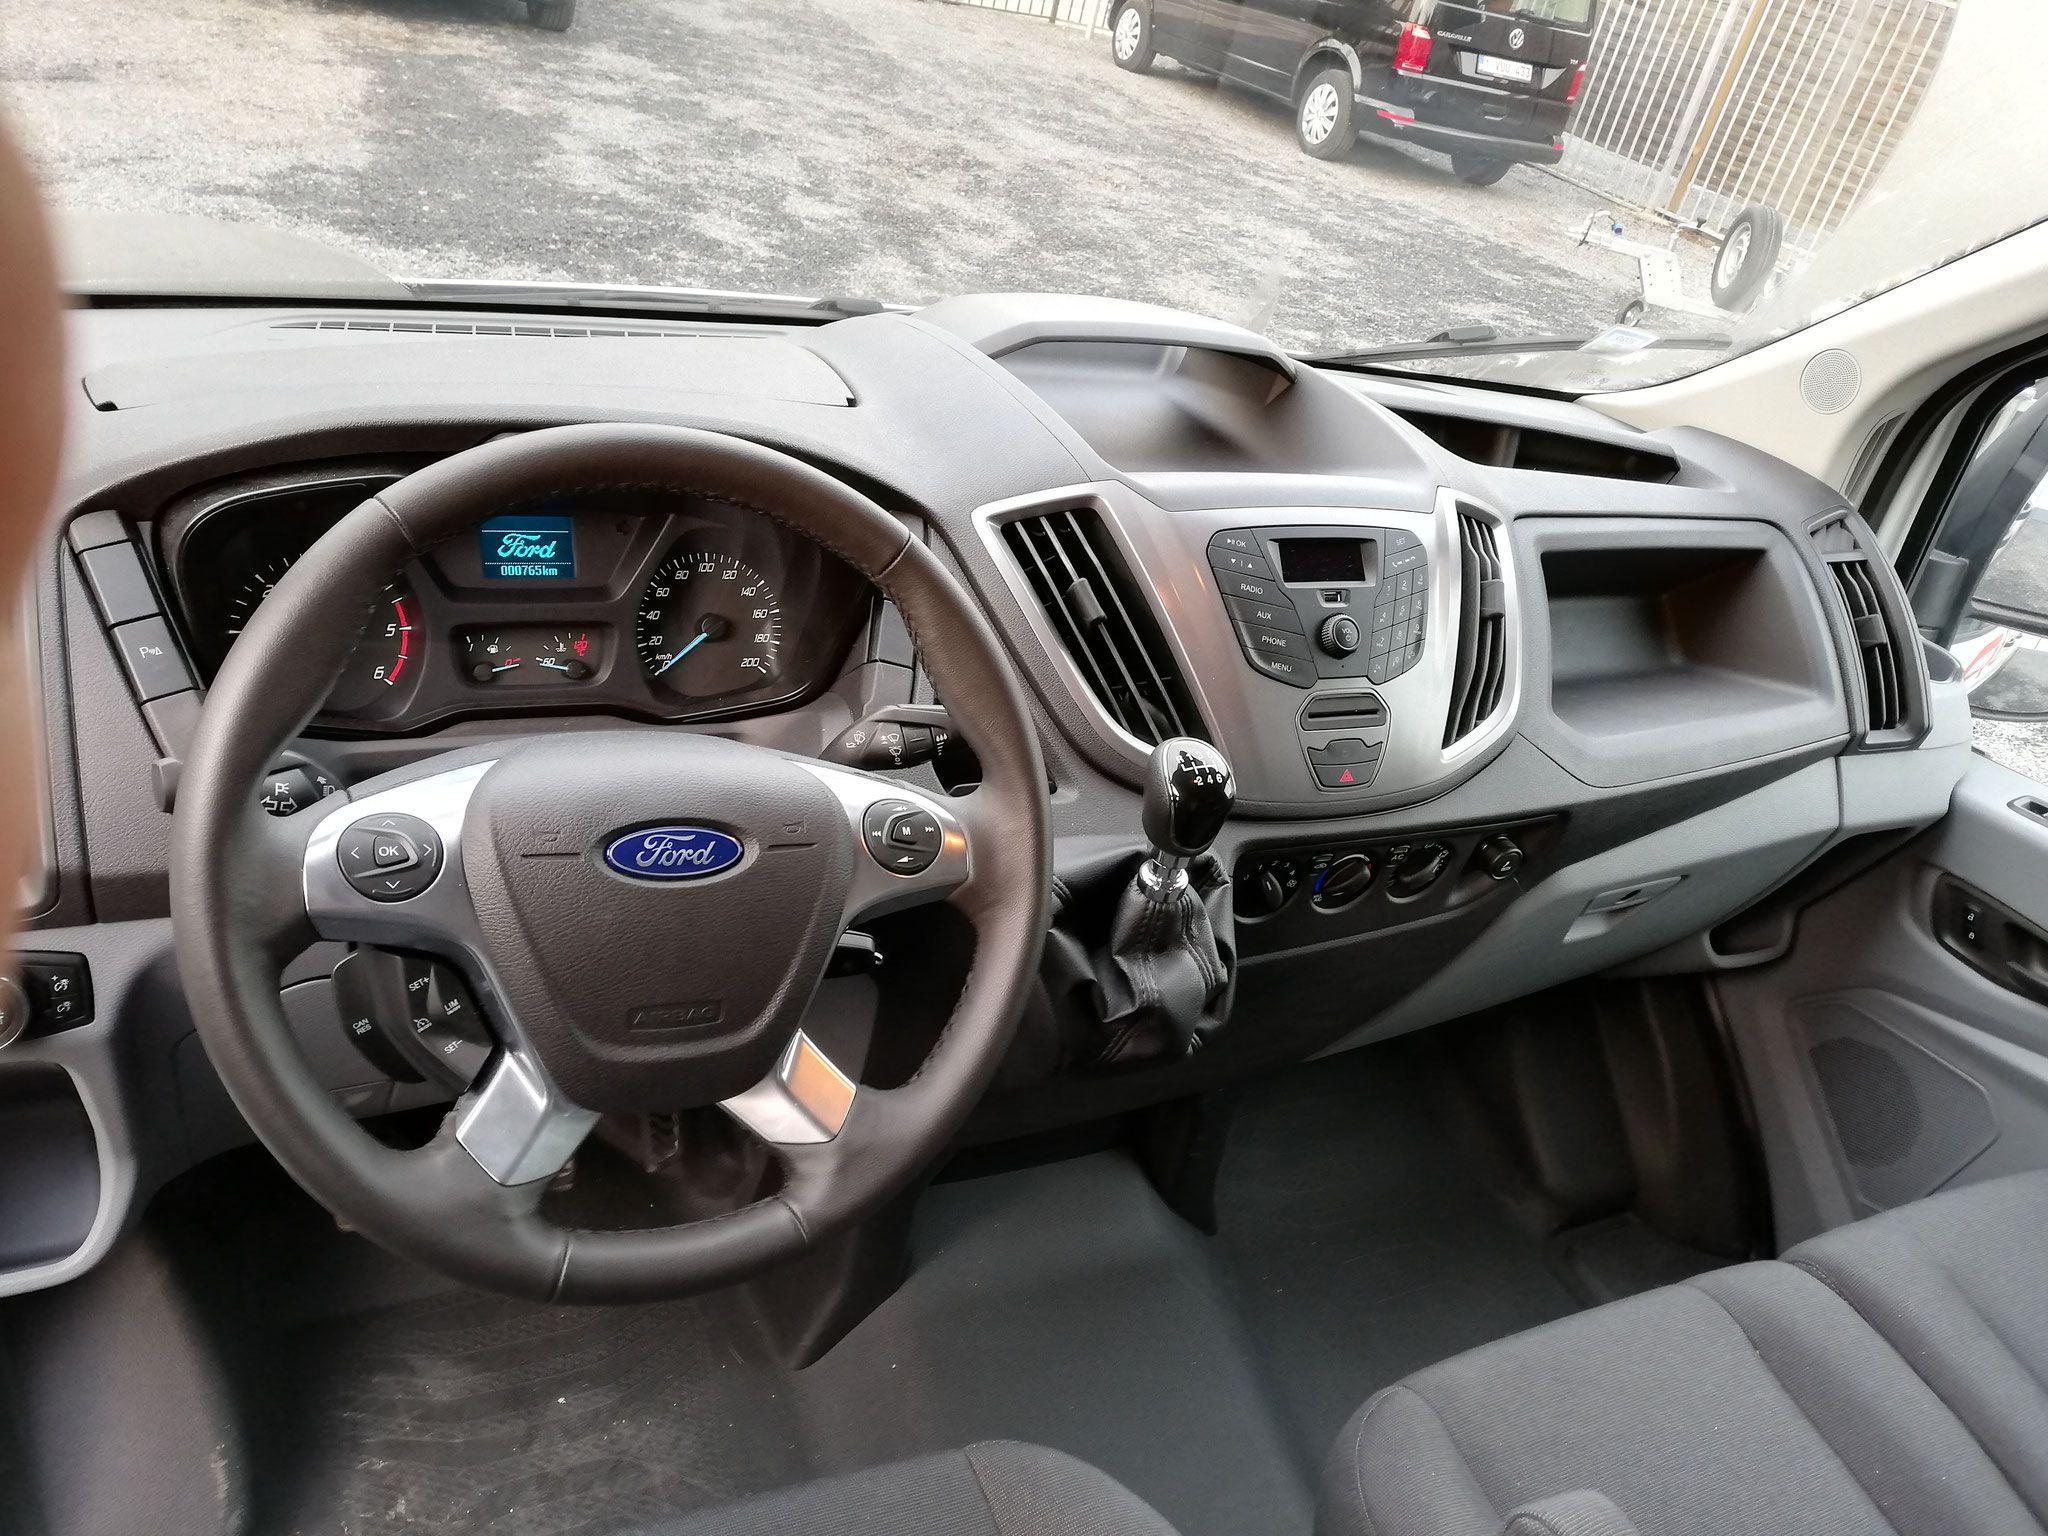 Ford Transit L3 H2 - image (9).jpg